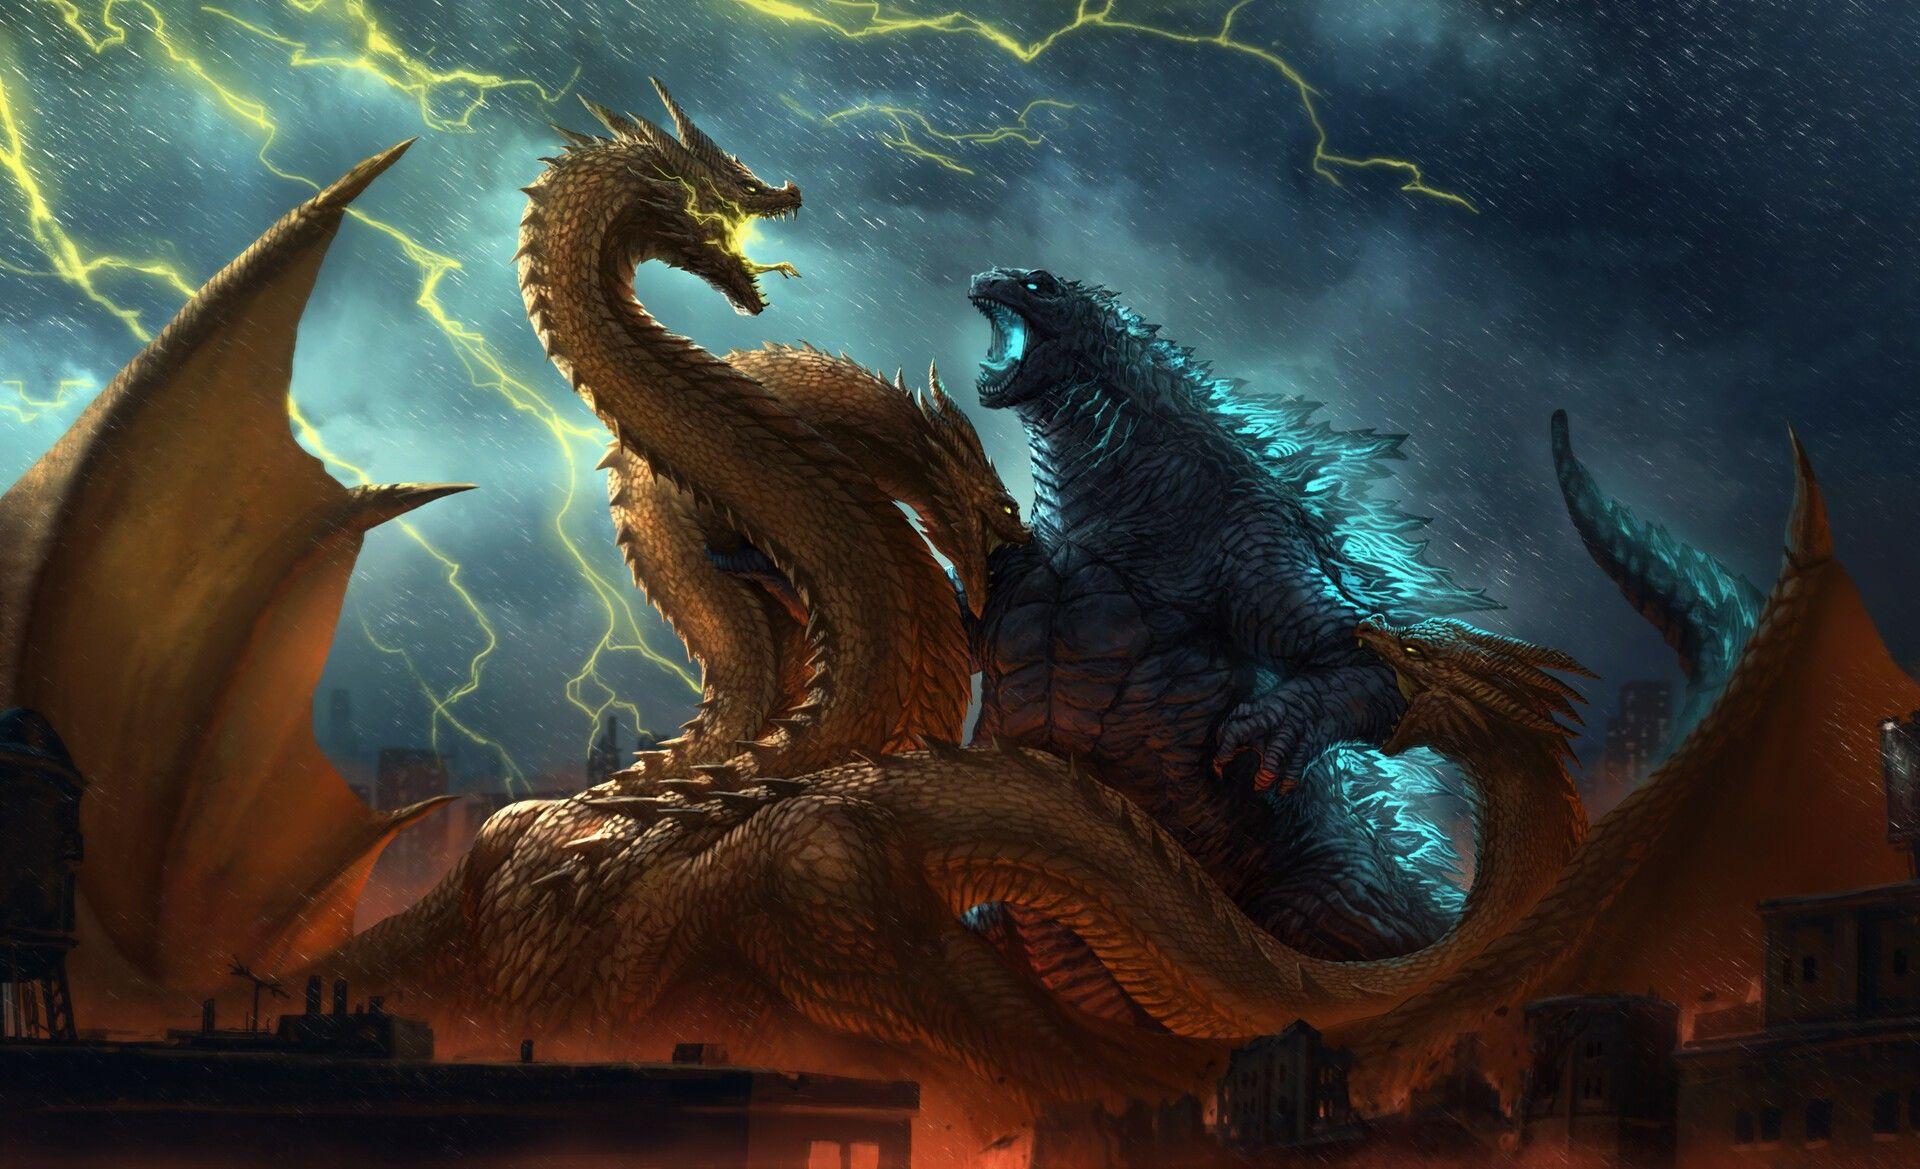 Pin By Lorraine Maples On Godzilla Godzilla Wallpaper Godzilla Vs King Ghidorah Godzilla